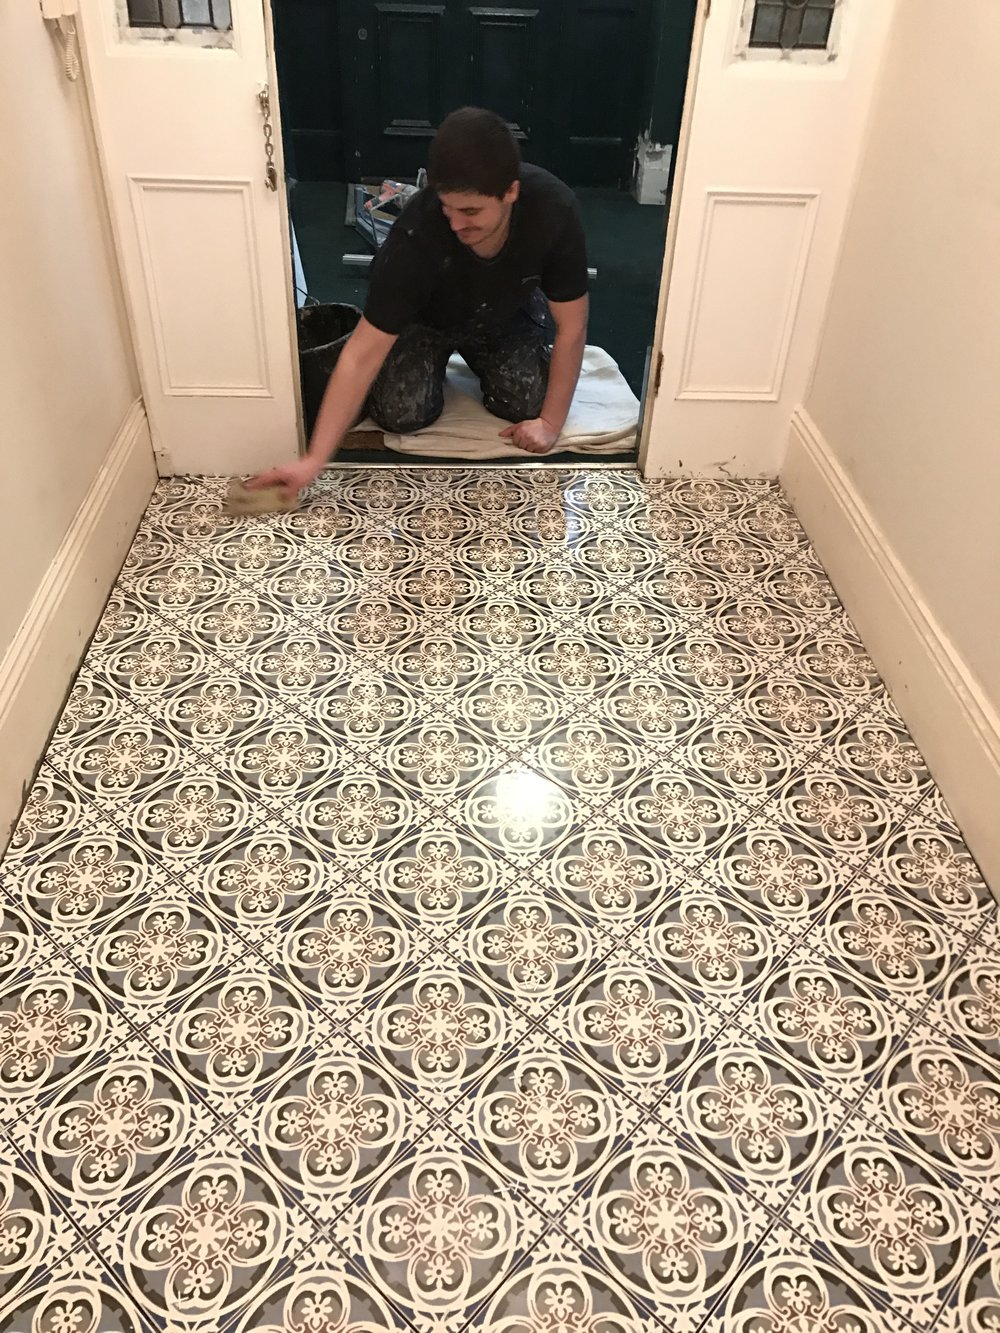 Tiledfloor